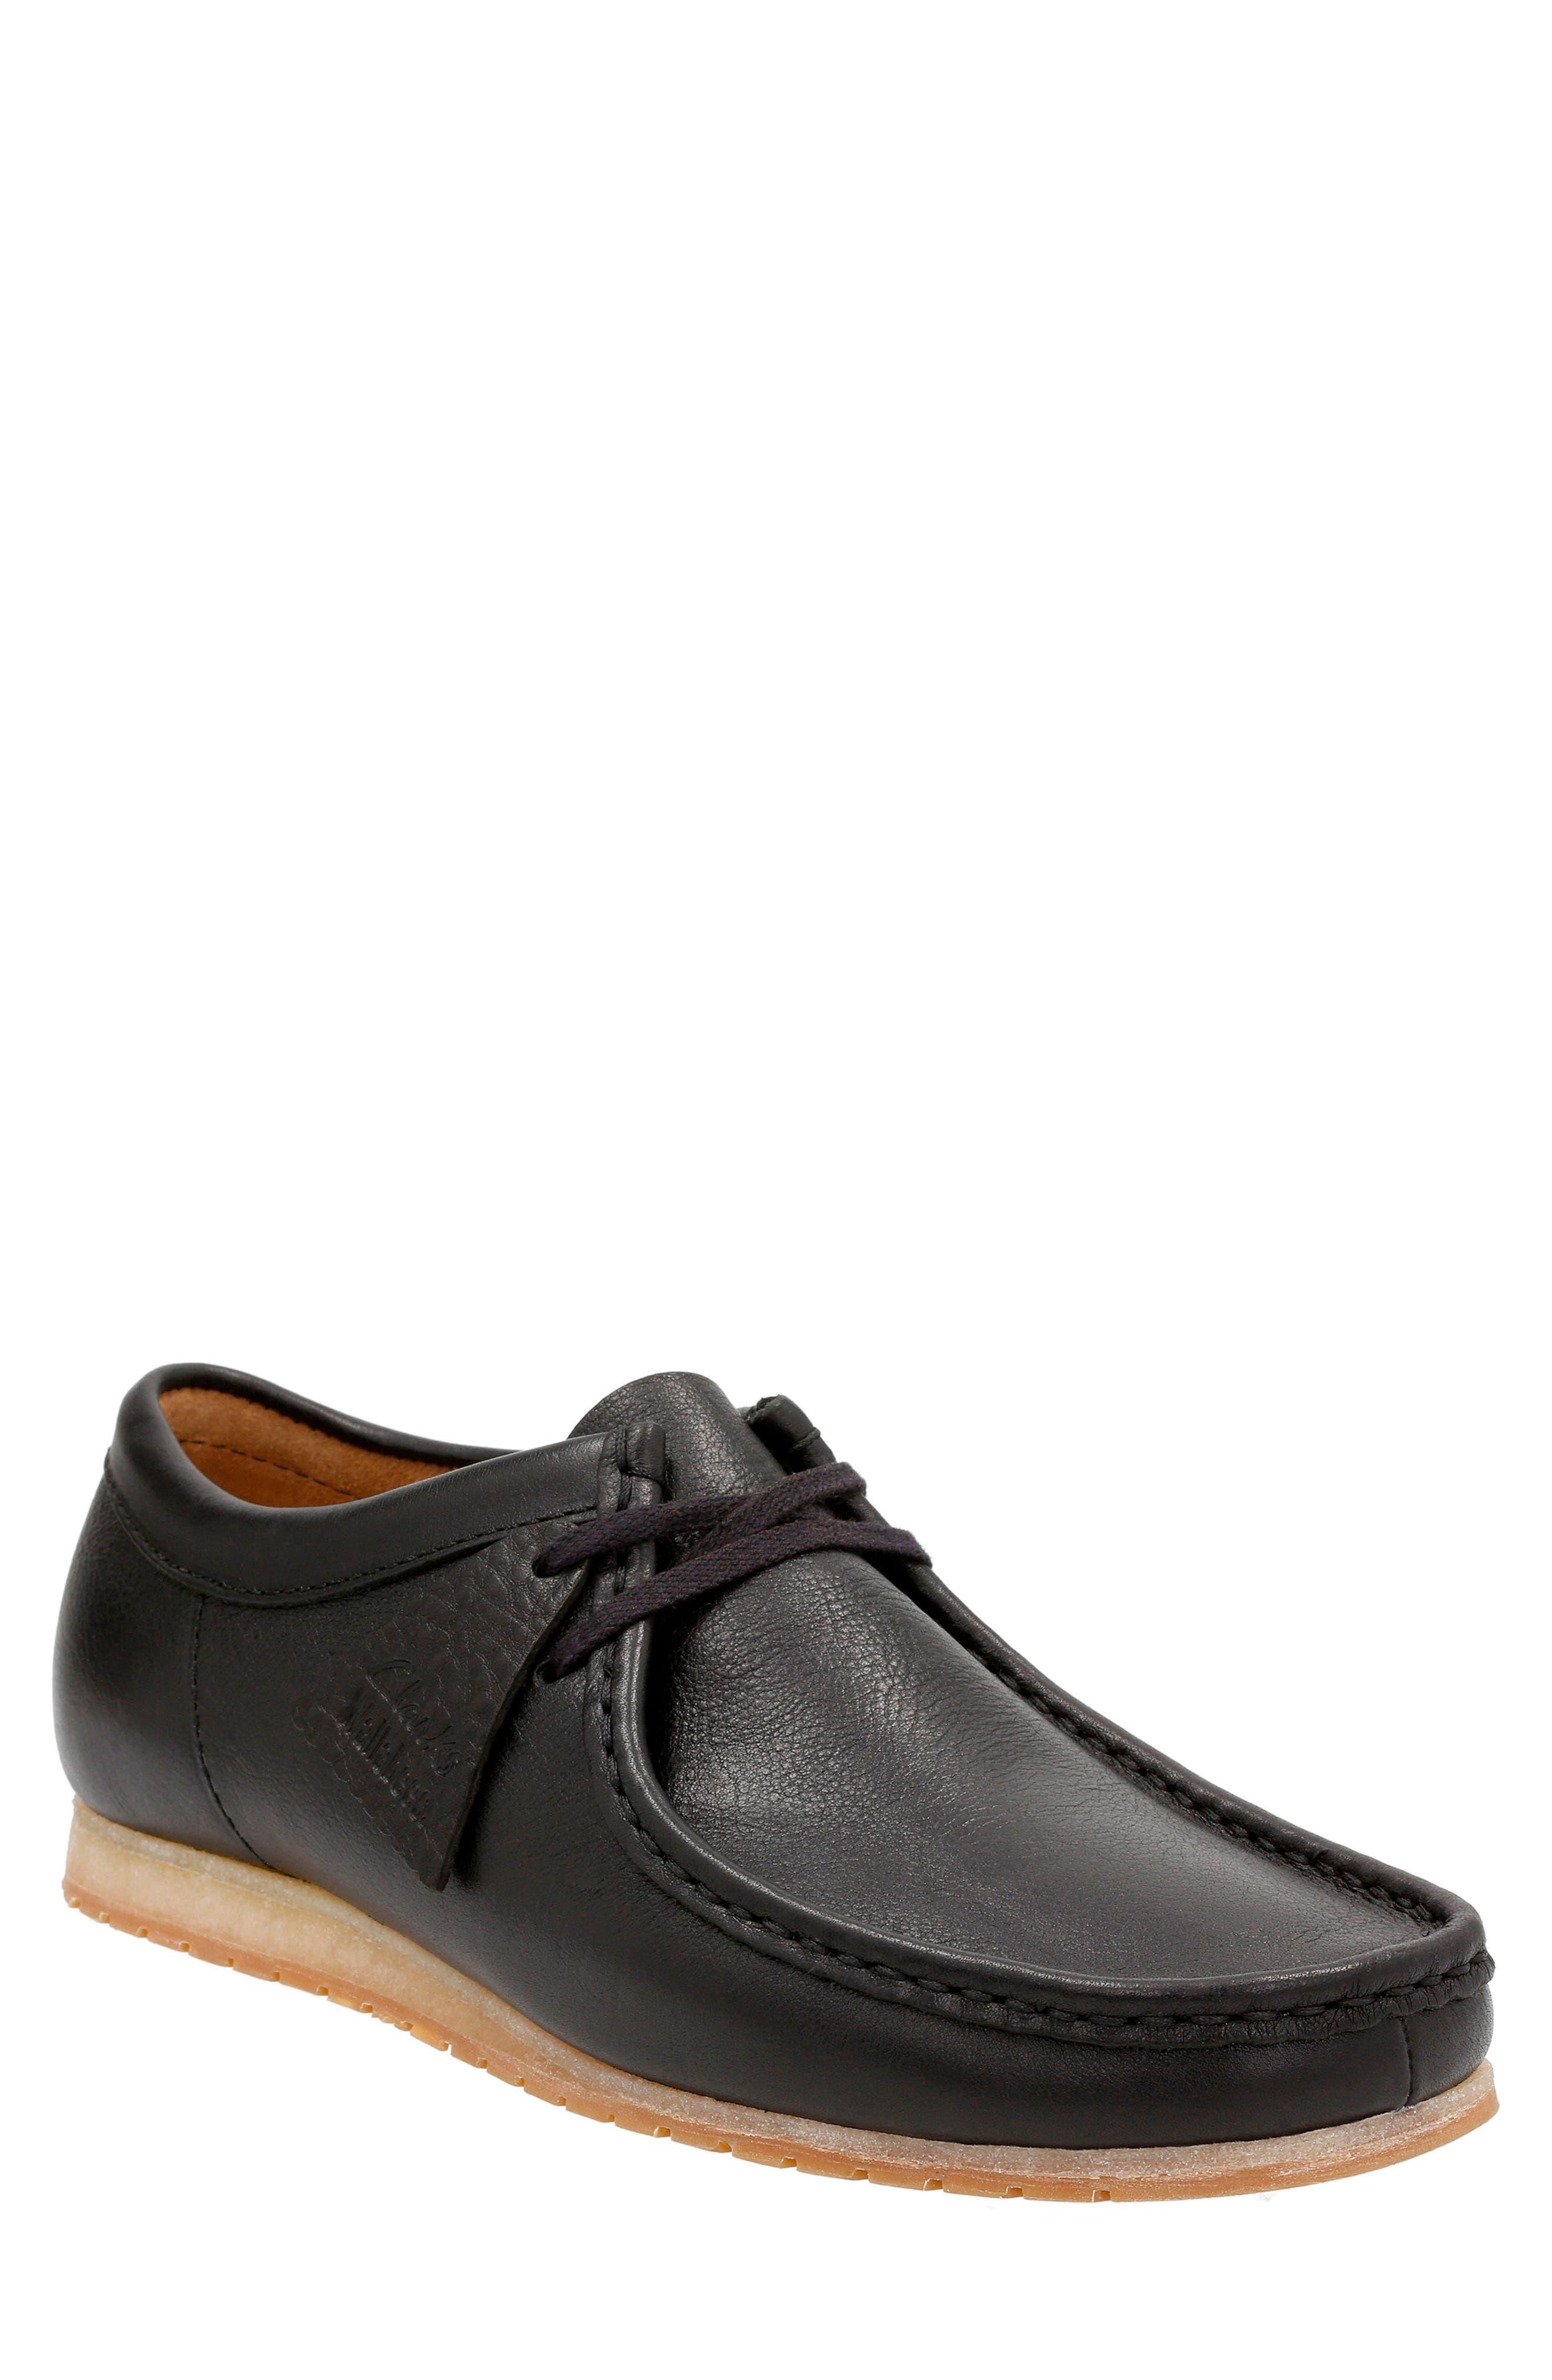 Clarks® Wallabee® Step Moc Toe Lace-Up Shoe (Men)